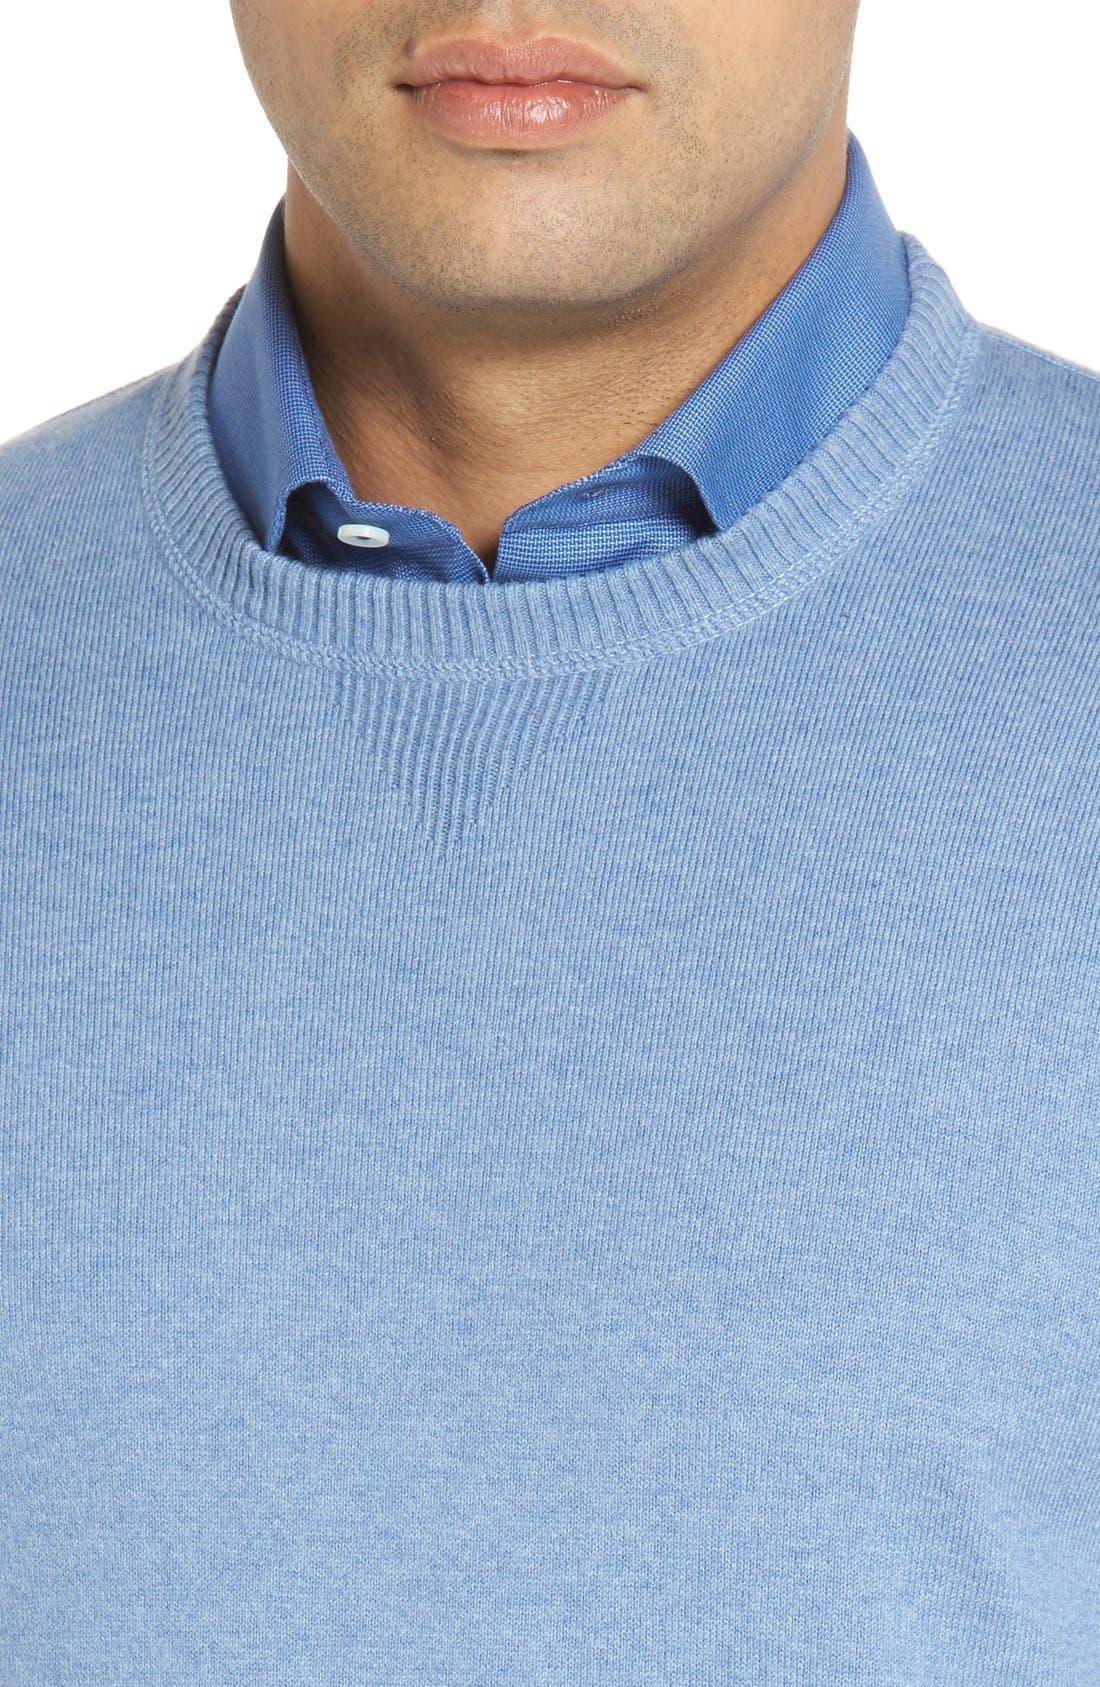 'Jersey Sport' Cotton Blend Crewneck Sweater,                             Alternate thumbnail 28, color,